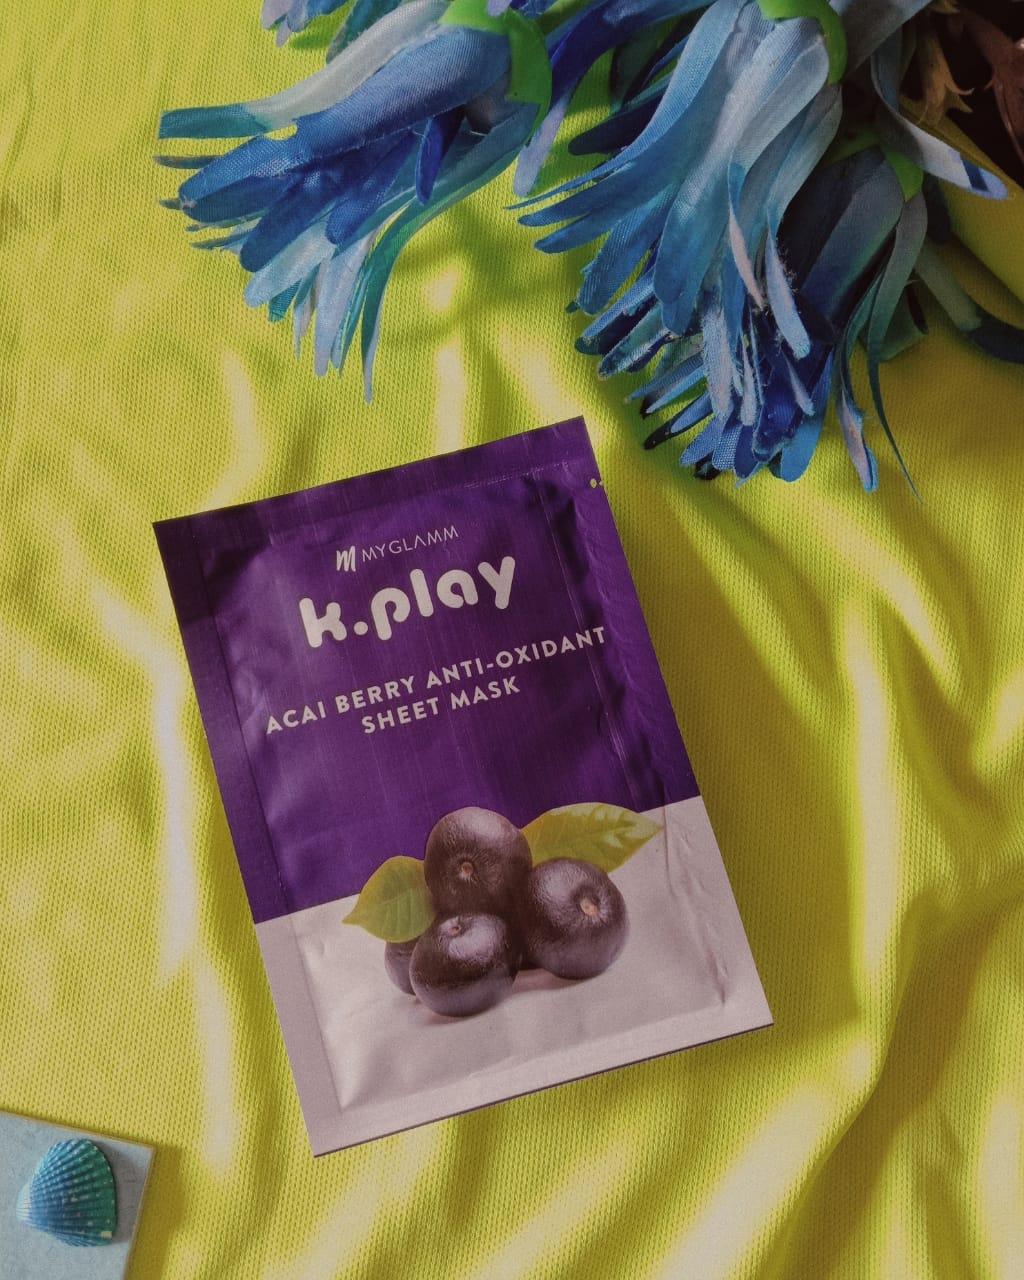 MyGlamm K.Play Acai Berry Anti-Oxidant Sheet Mask-Review-By sreya_ray